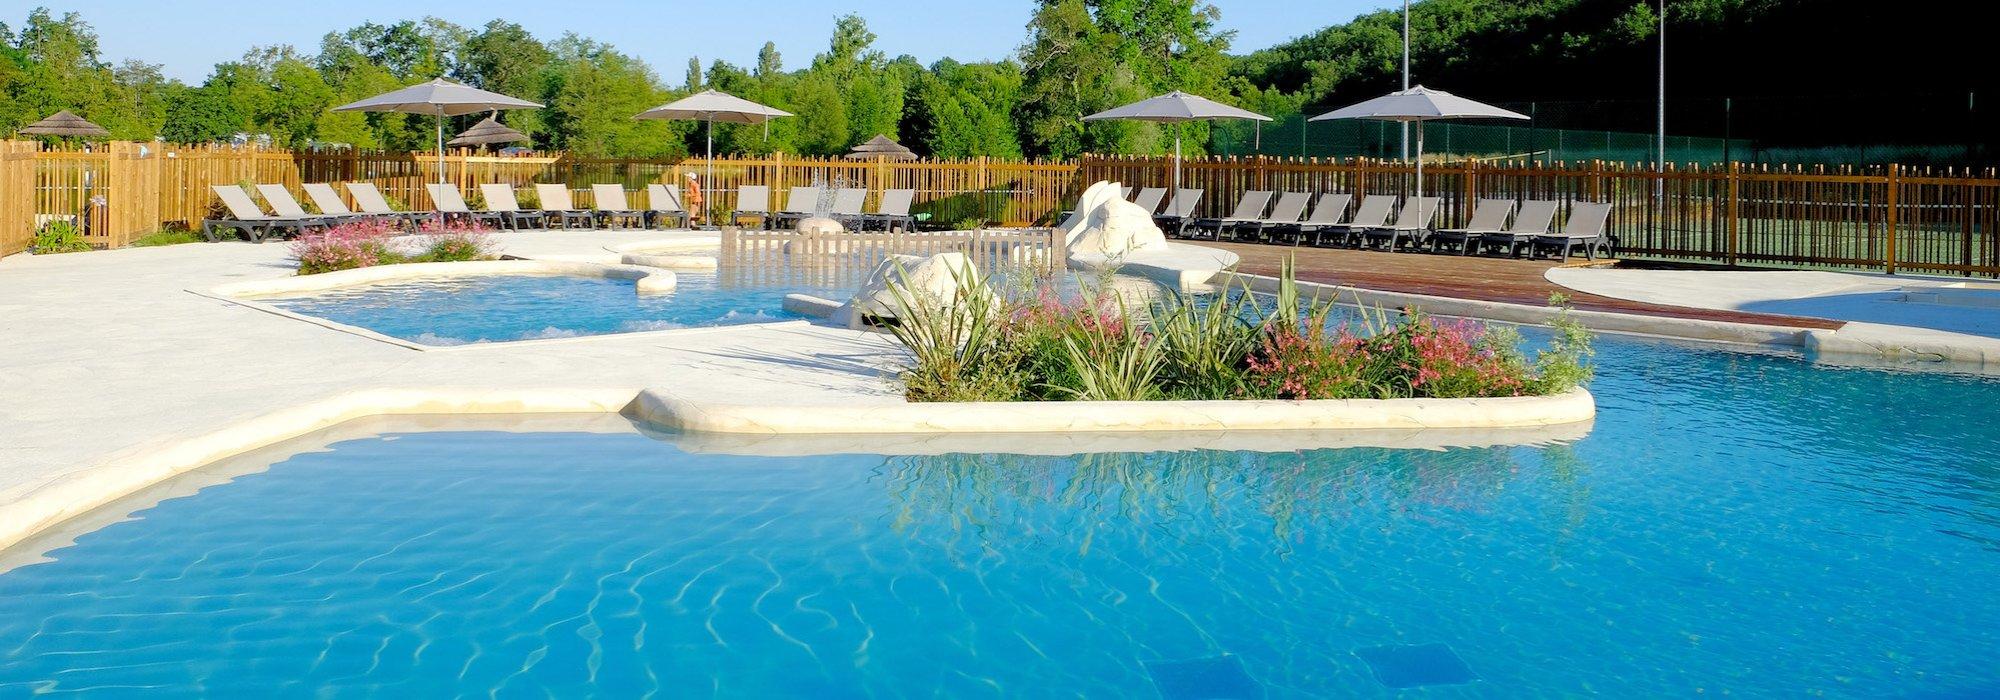 Camping pomport beach dordogne piscines camping for Camping bergerac avec piscine